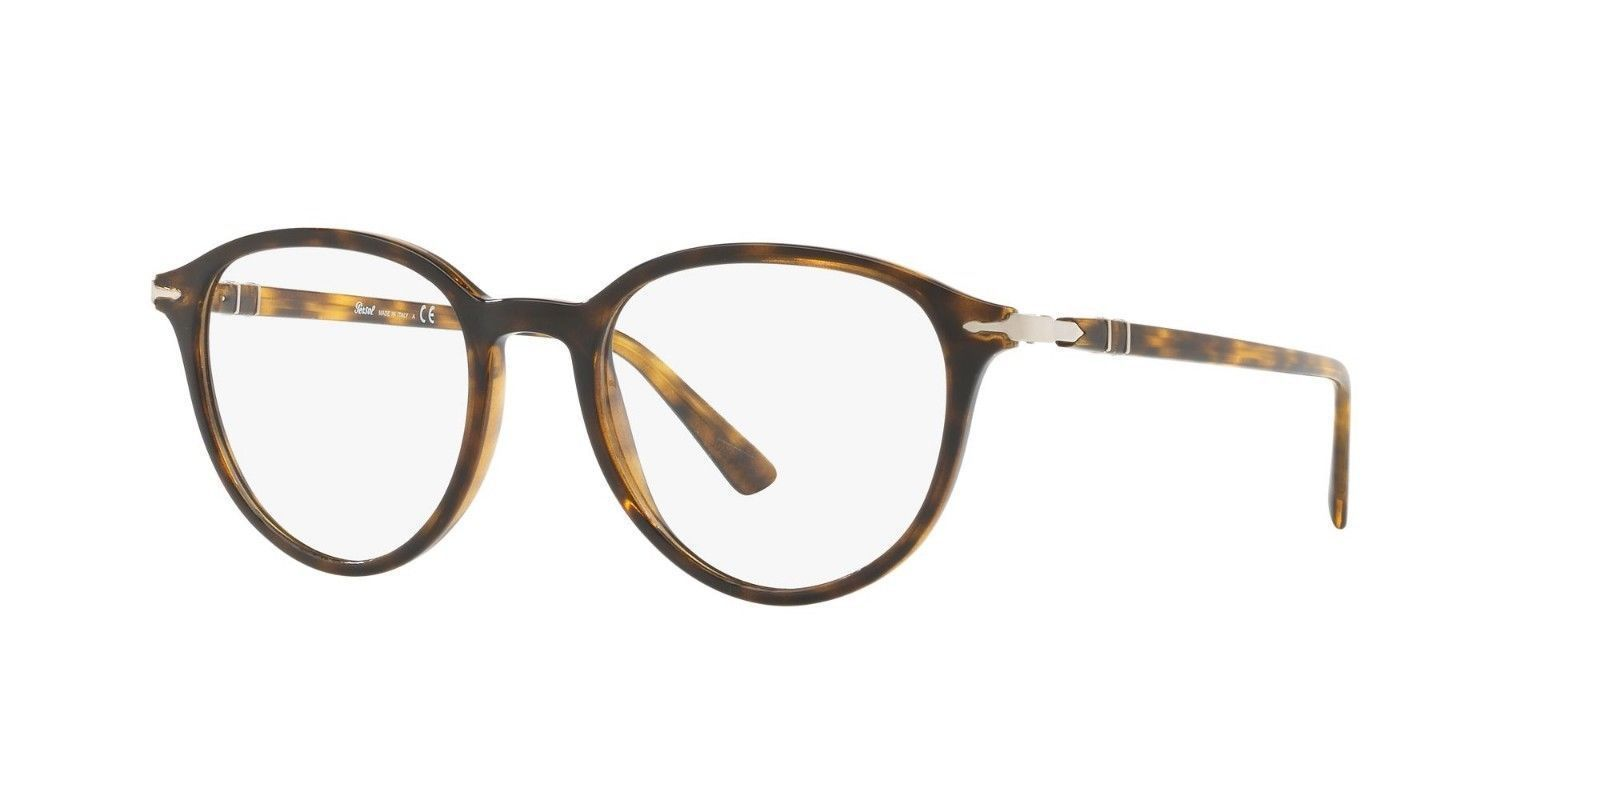 06a65add76 Persol Men Oval Eyeglasses PO3169V 1054 Havana Frame Demo Customisable Lens  - ₹6